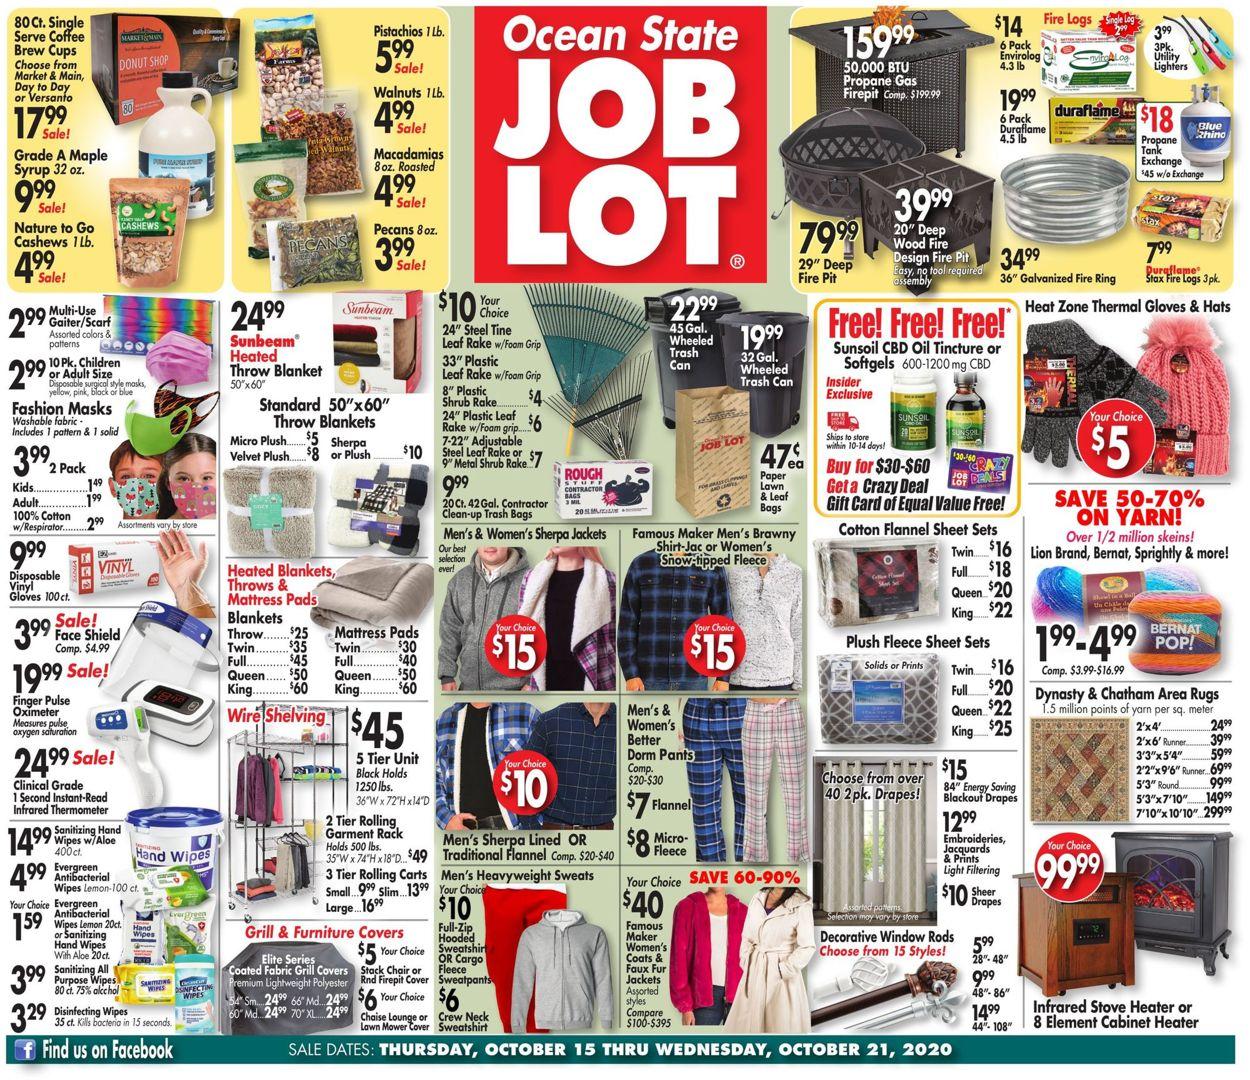 Ocean State Job Lot Weekly Ad Circular - valid 10/15-10/21/2020